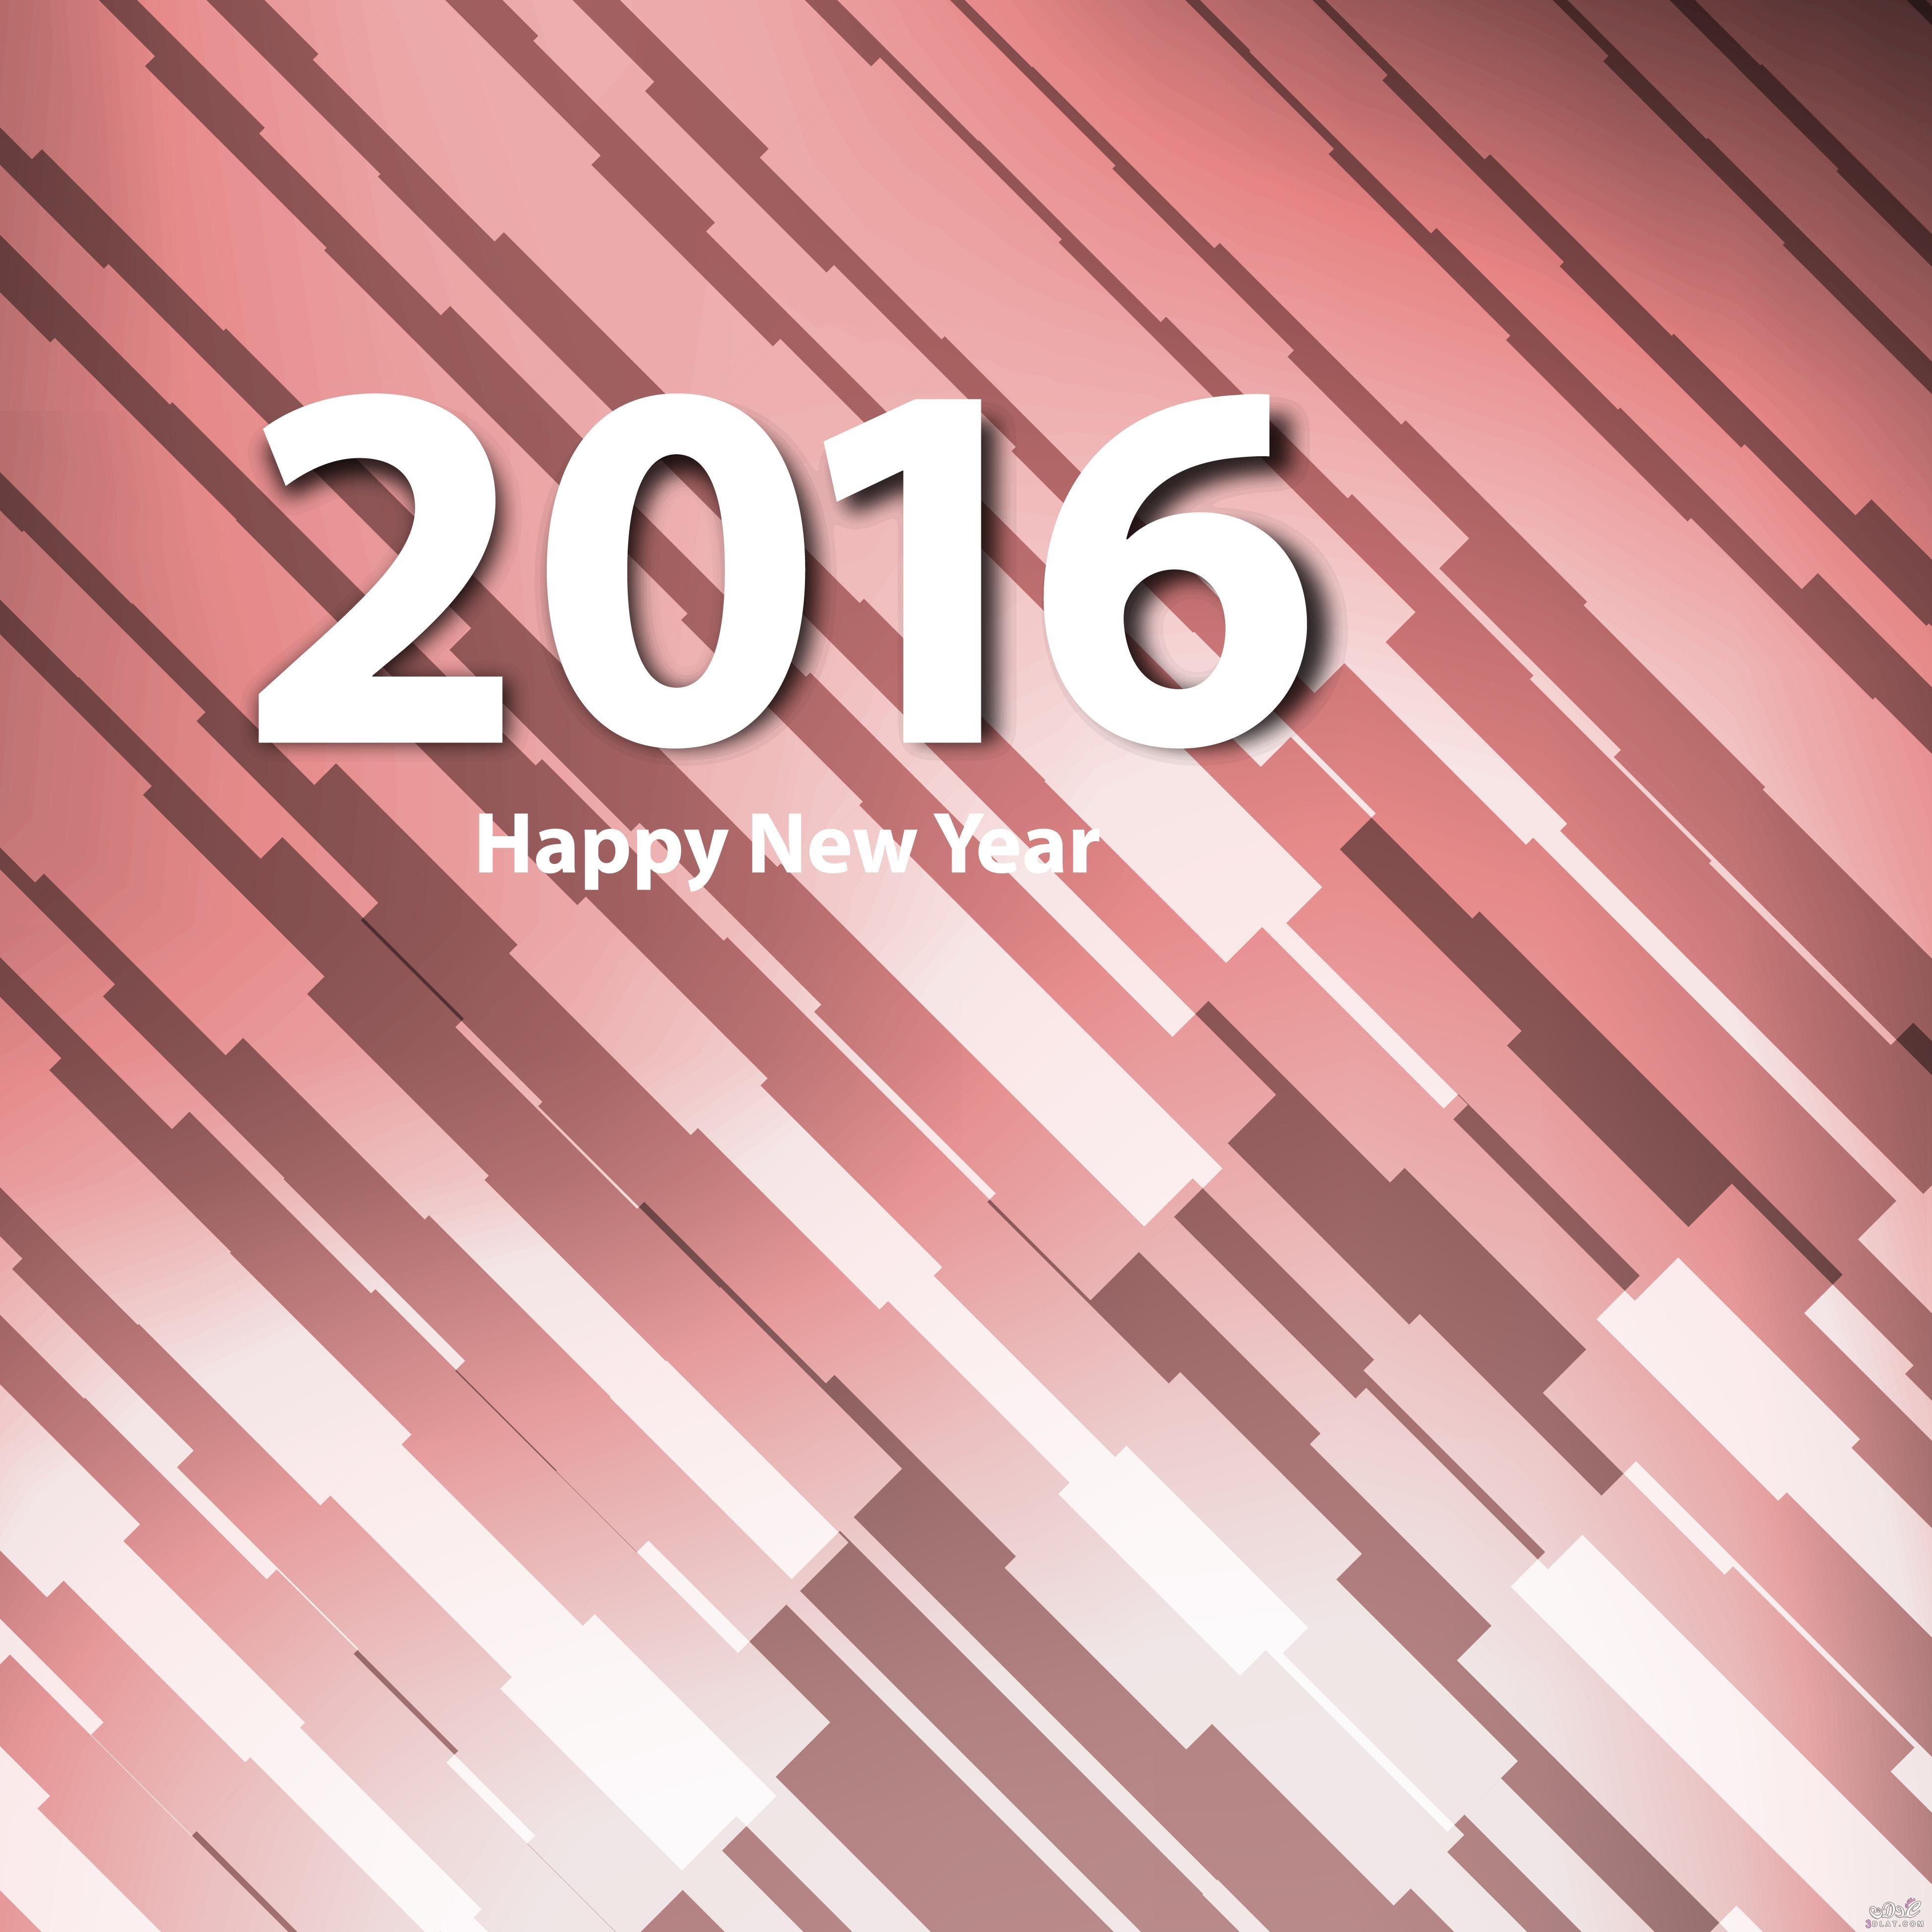 احلي صور للتهنئة بعام 2016 (1)